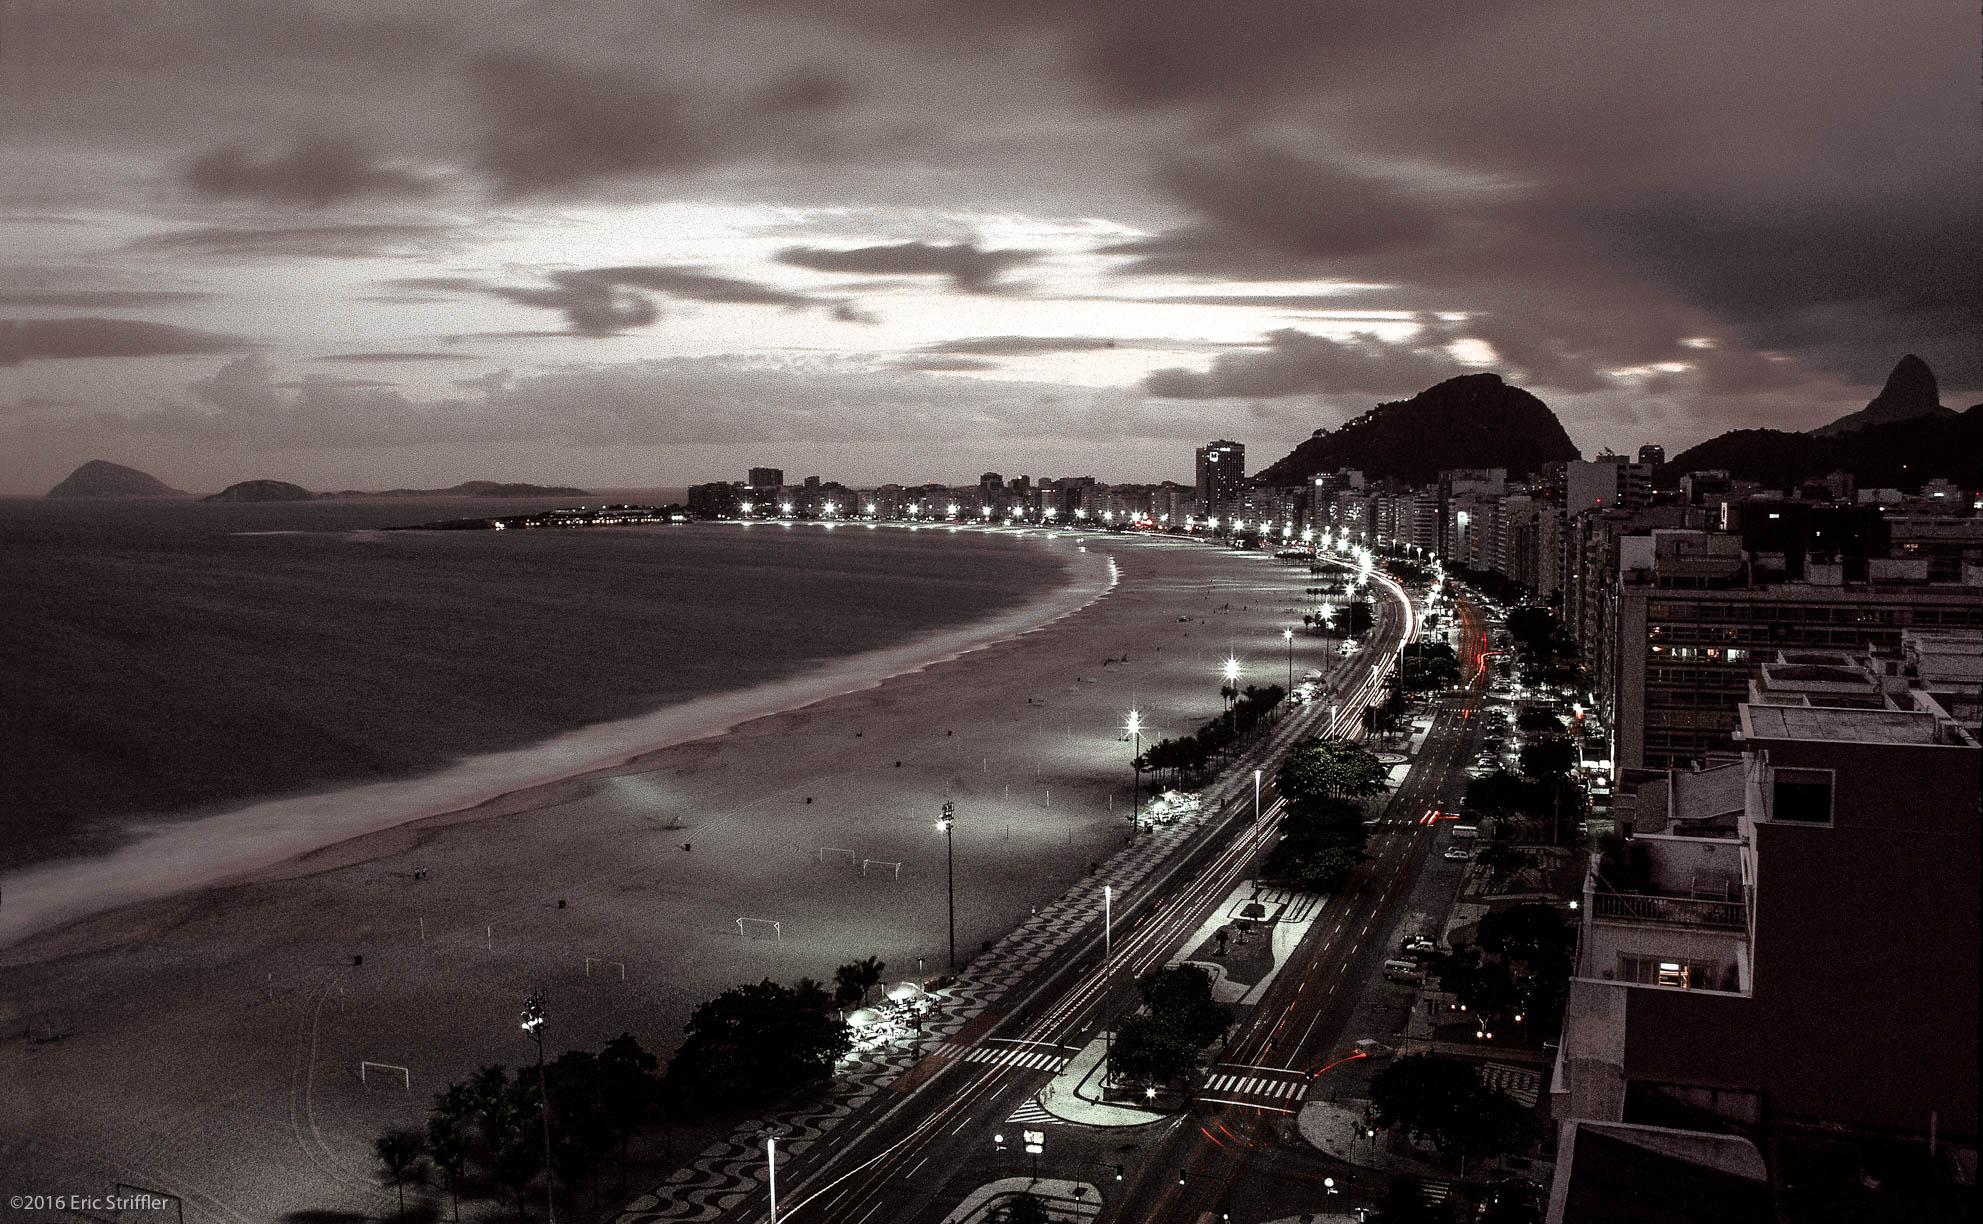 eric_striffler_photography_travel-102.jpg